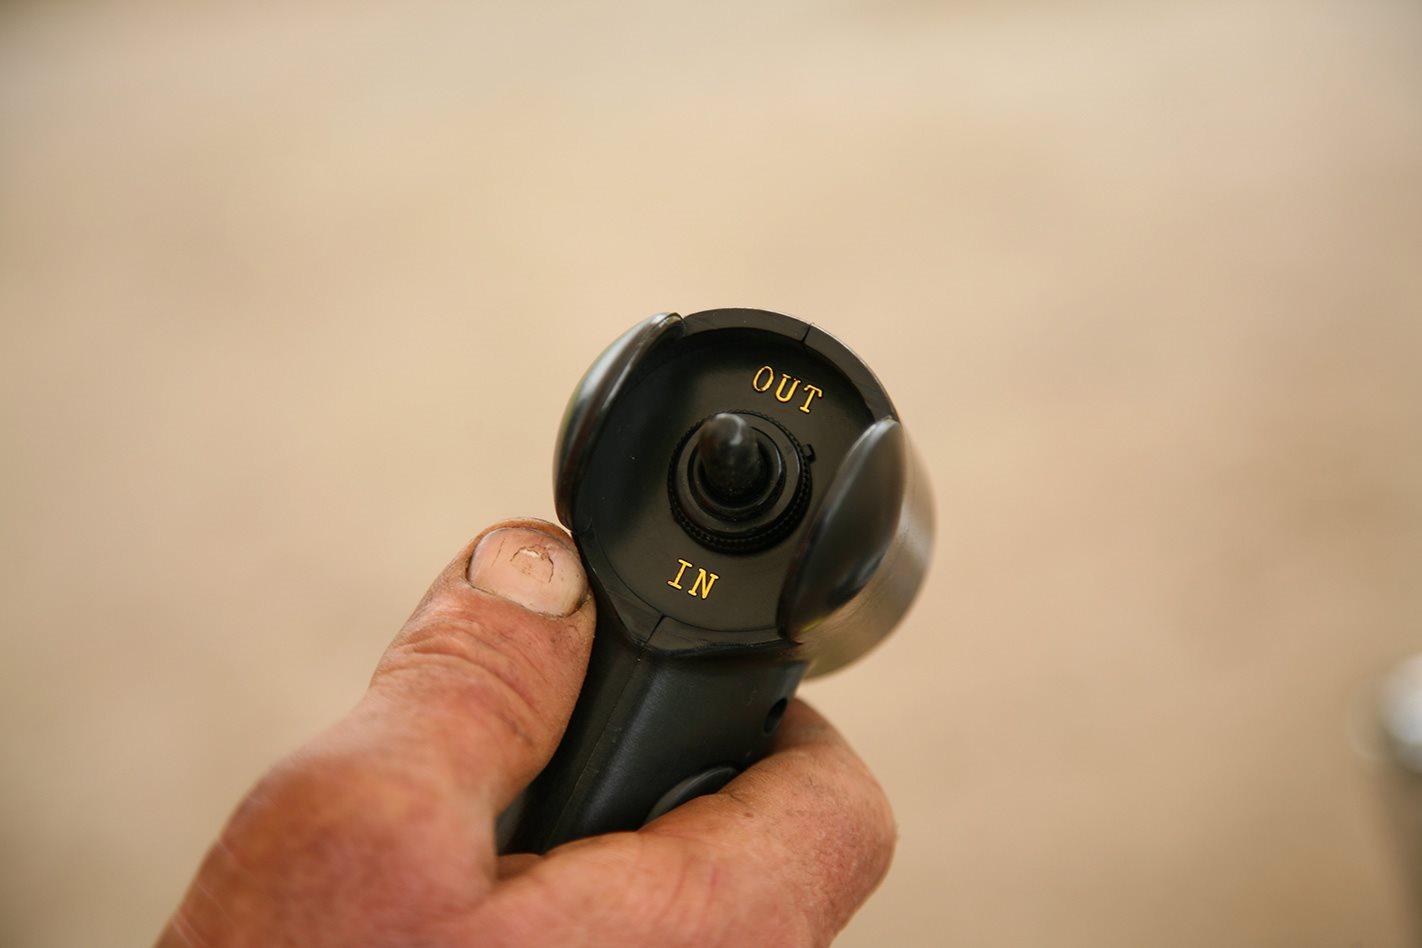 Runva EWX 9500-Q hand remote